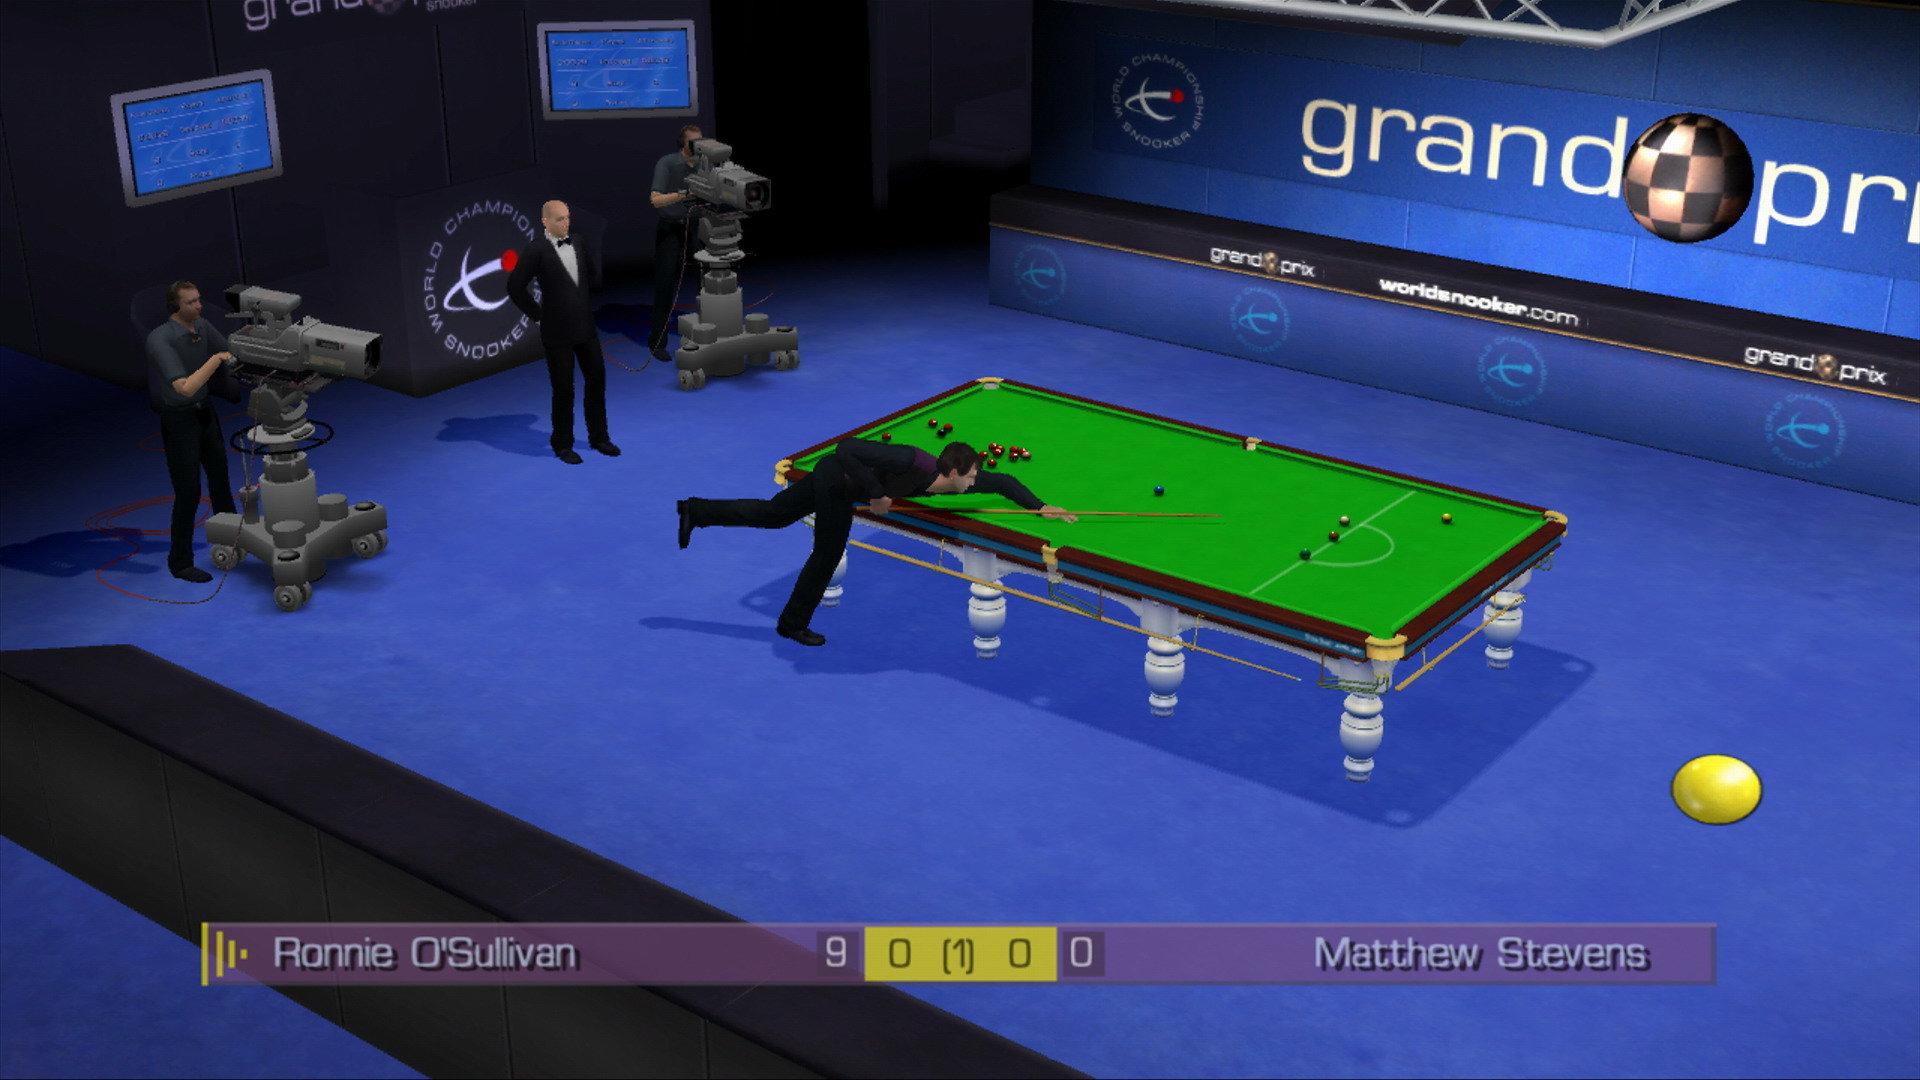 World Snooker Championship 2007 PS3 1080p